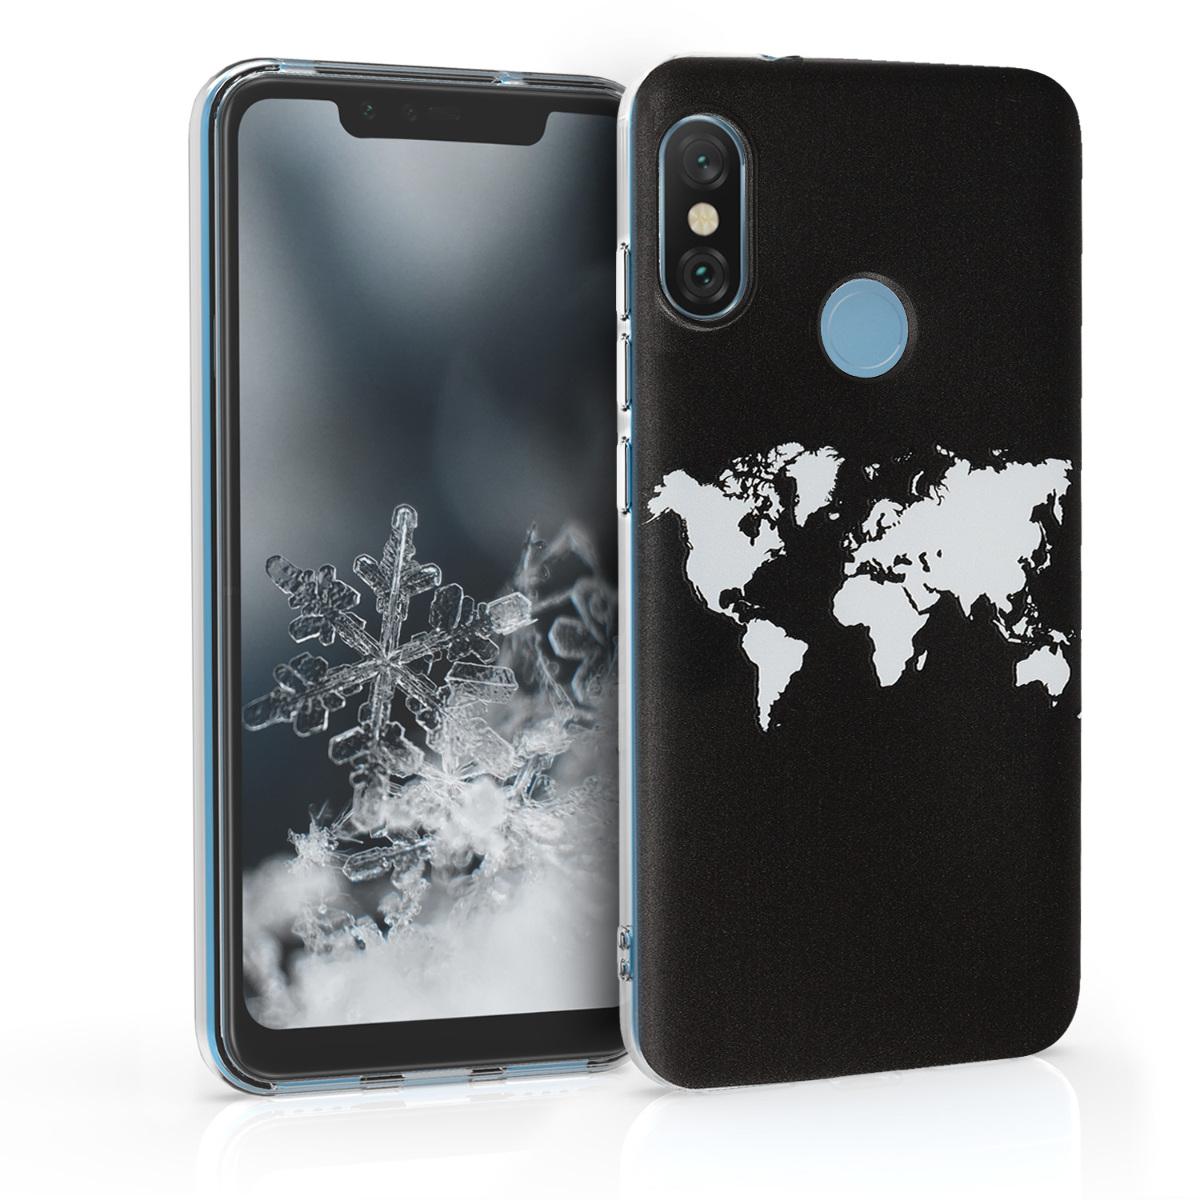 Kvalitní silikonové TPU pouzdro | obal pro Xiaomi Redmi 6 Pro | Mi A2 Lite - Travel Outline bílý / černý